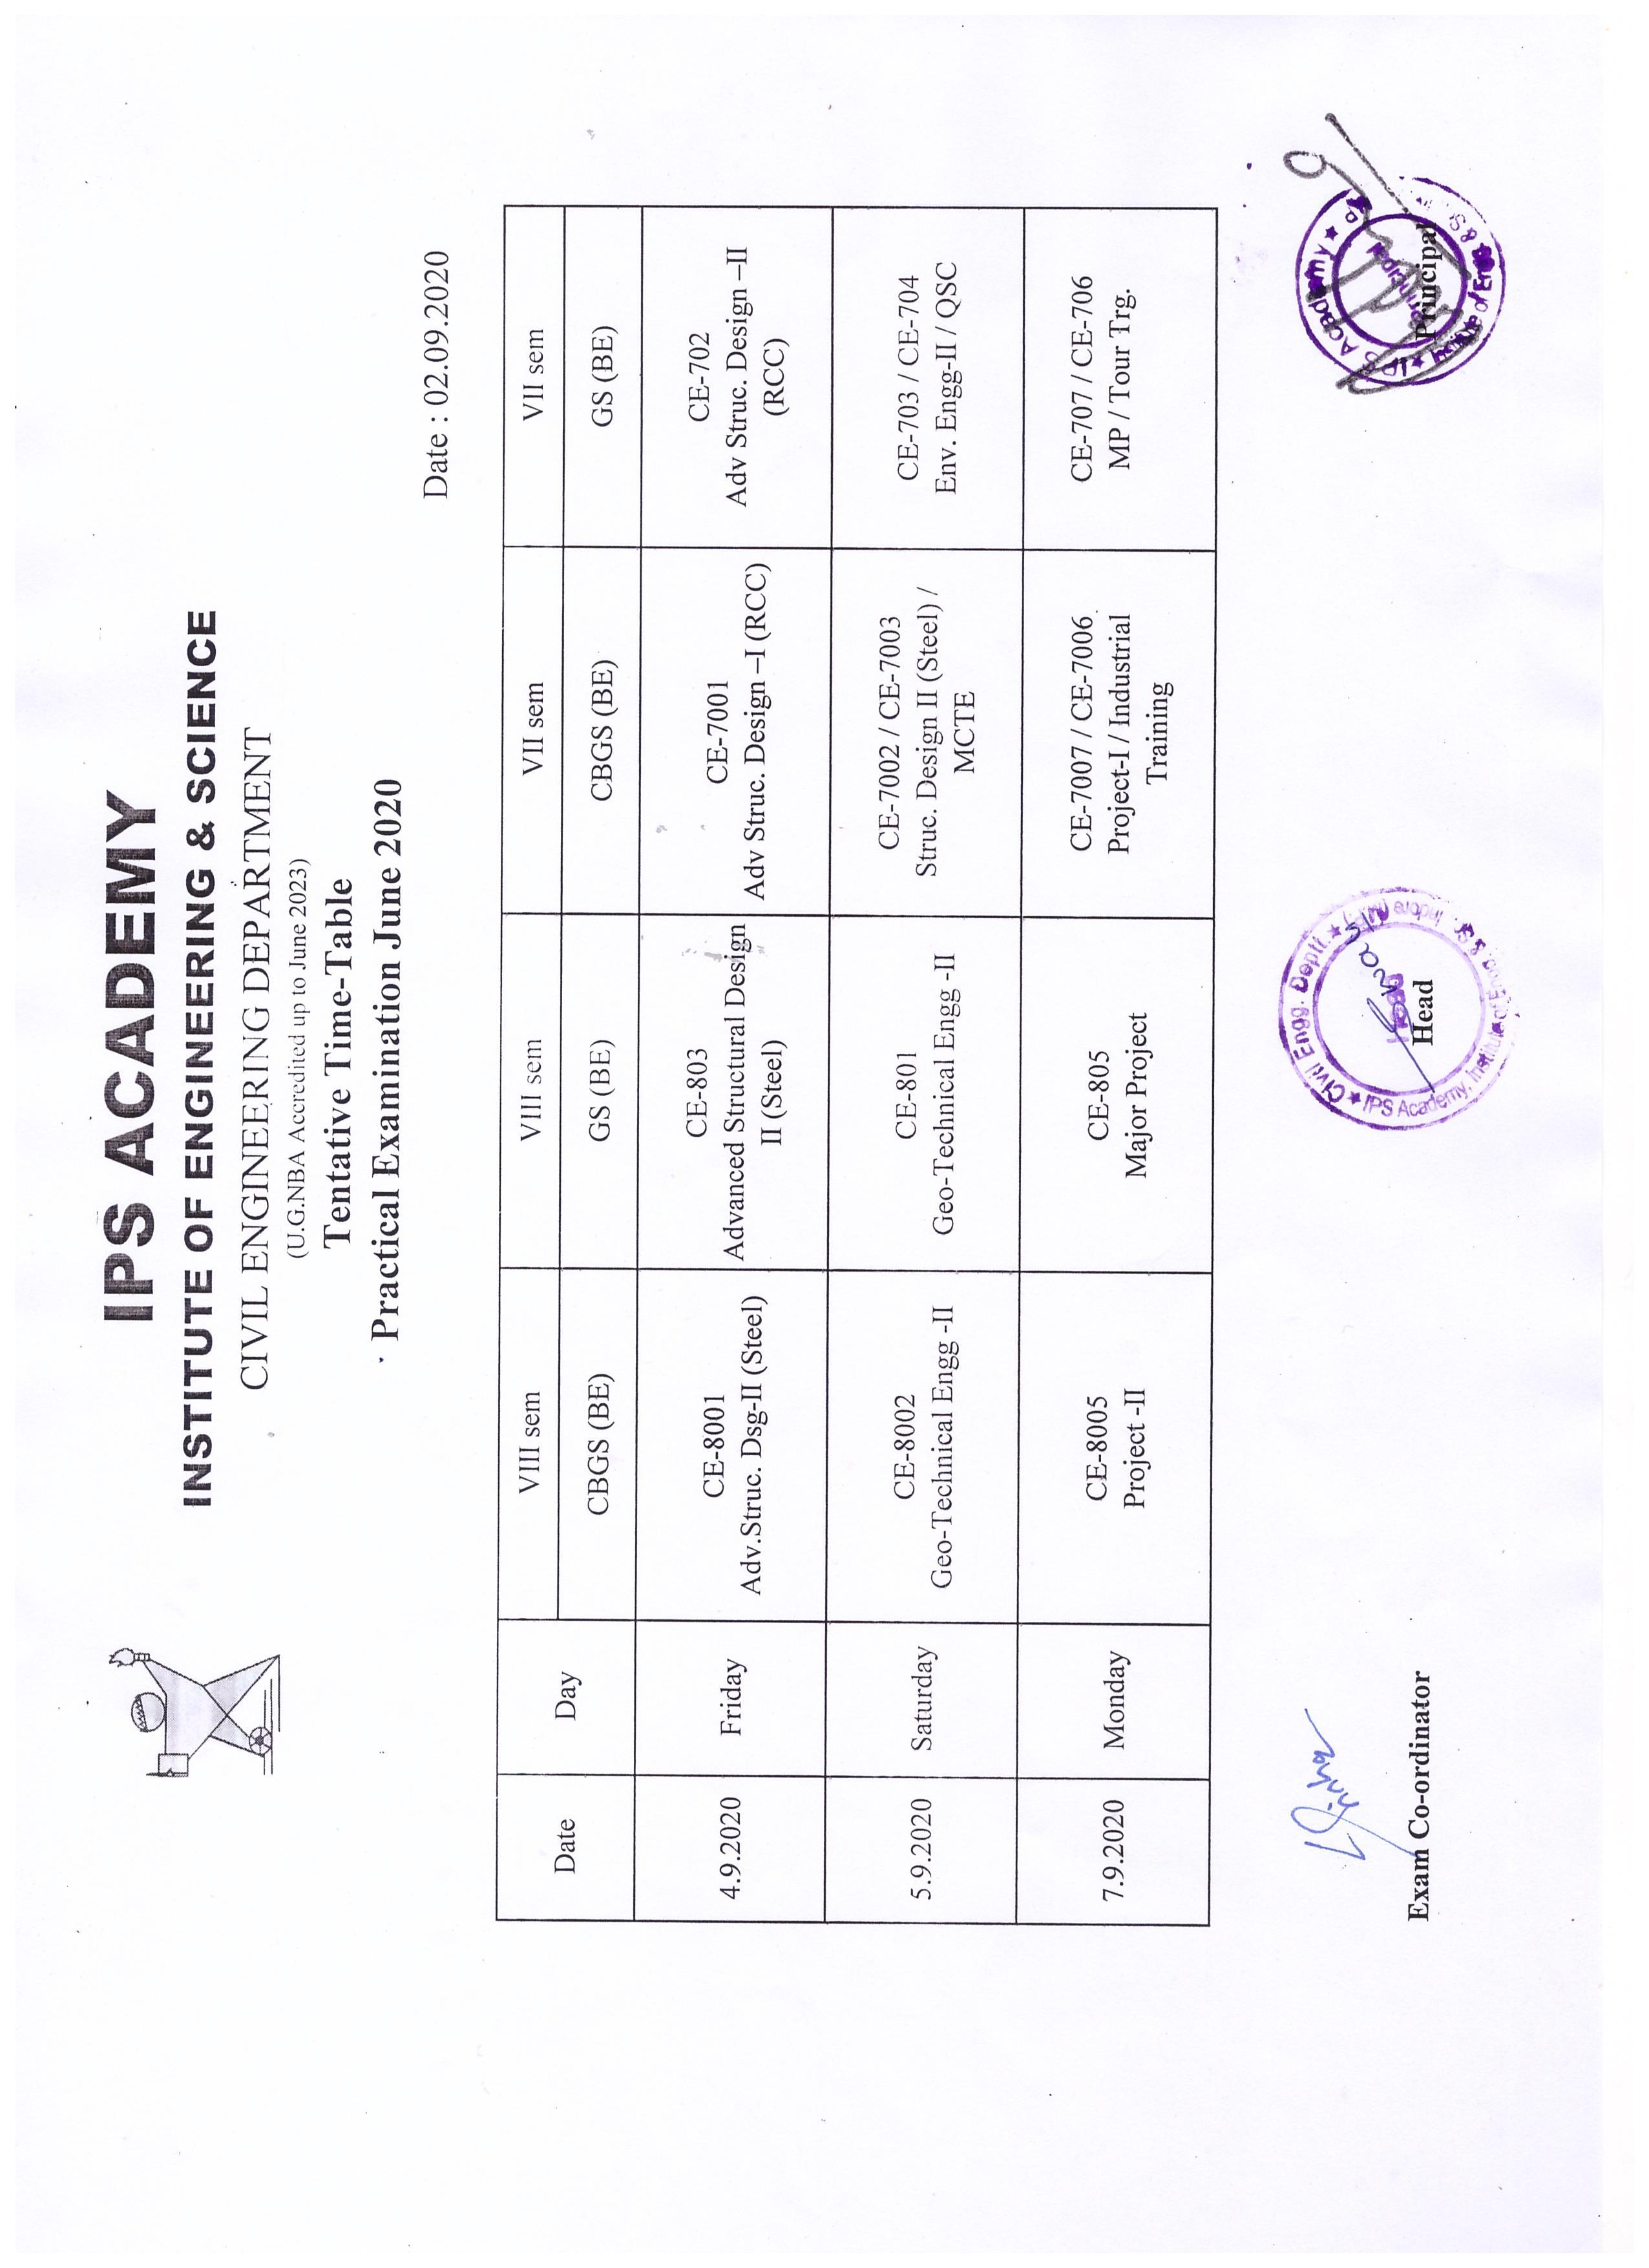 viii-sem-practical-exam-time-table-june-2020-civil